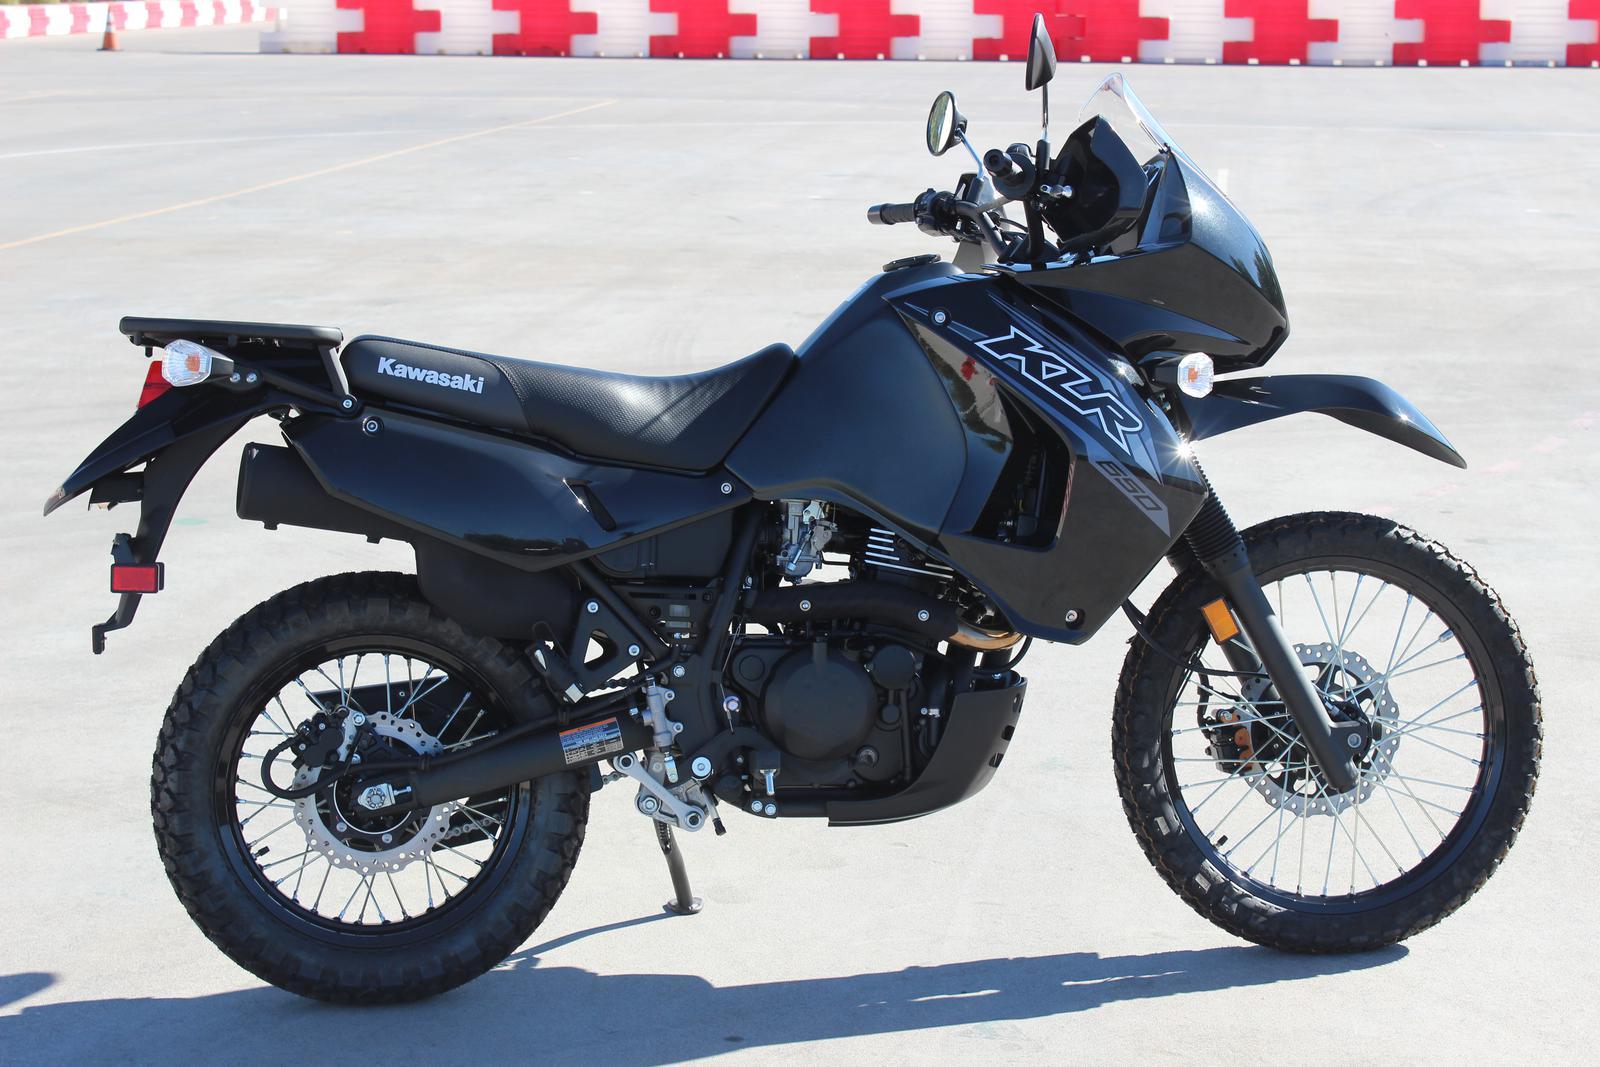 2018 Kawasaki KLR650 for sale in Scottsdale, AZ. GO AZ Motorcycles ...